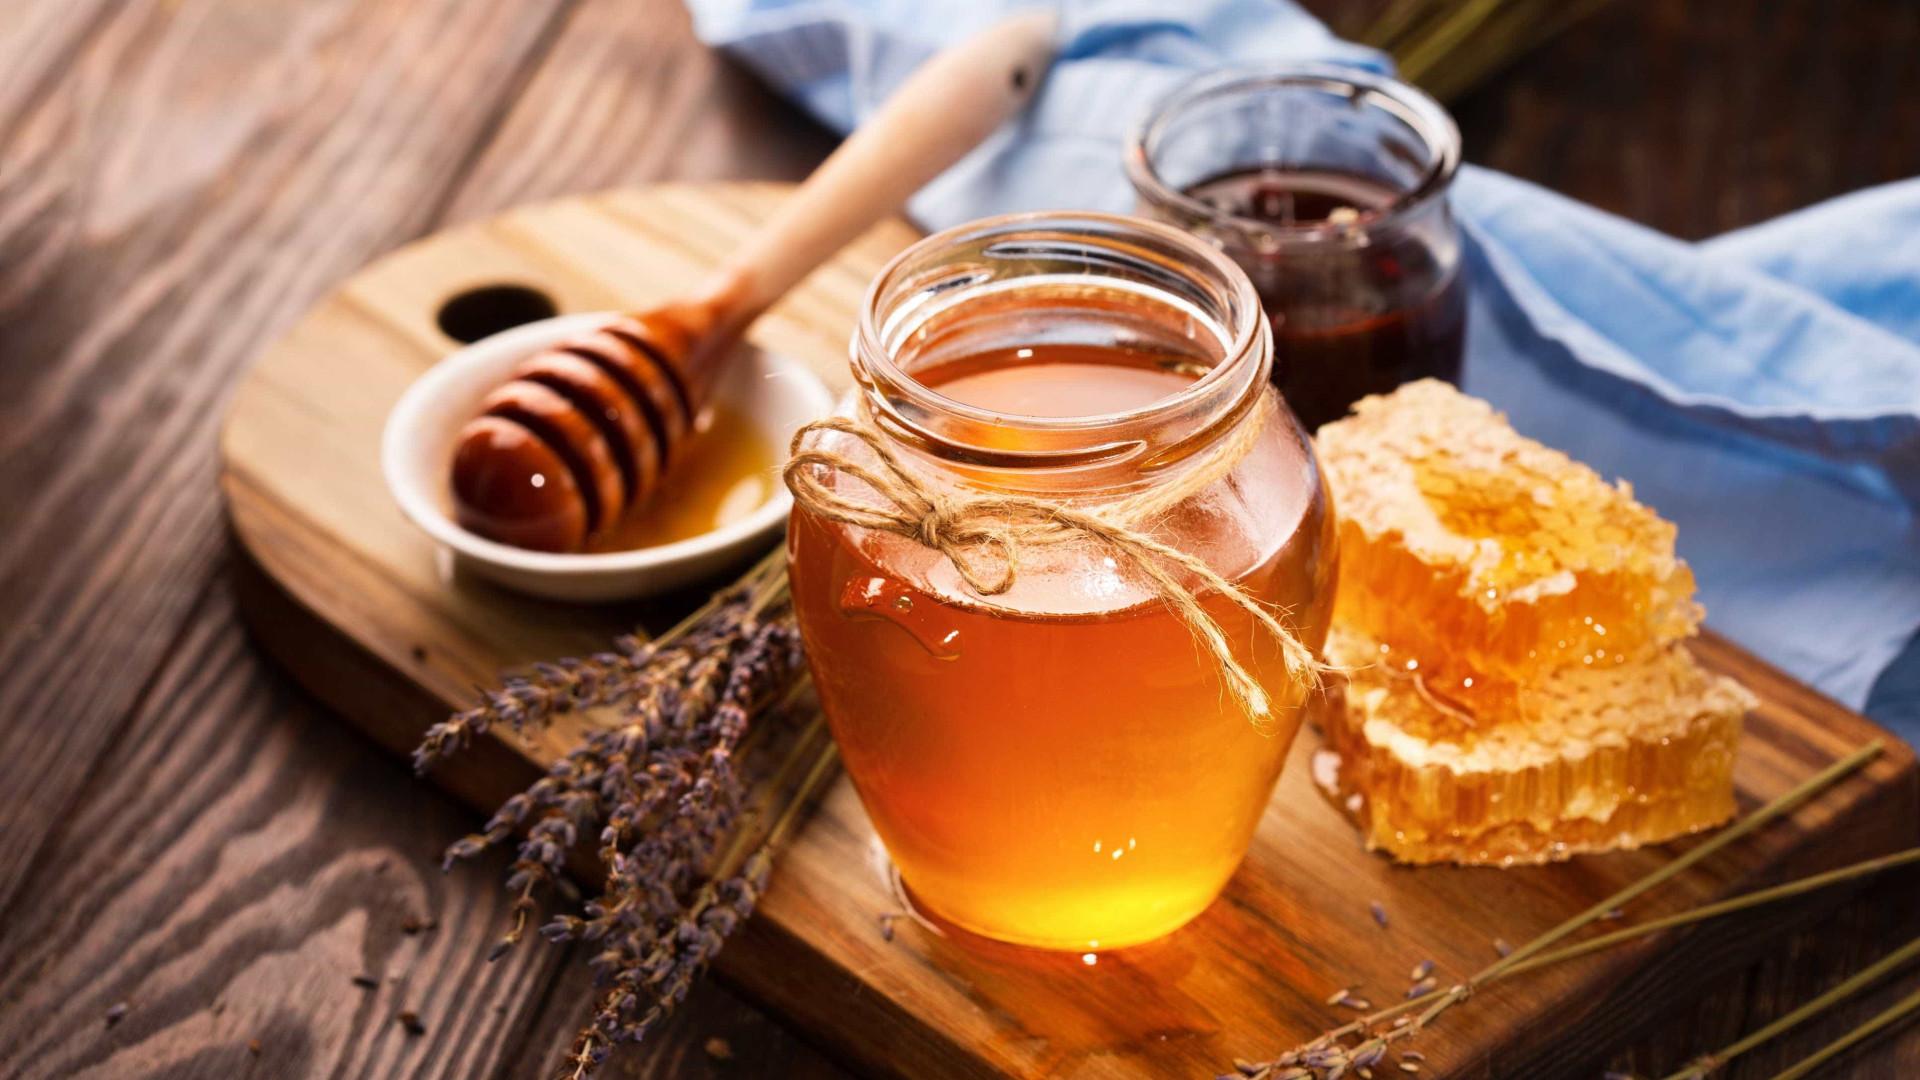 Porque é que a validade do mel é (quase) infinita?